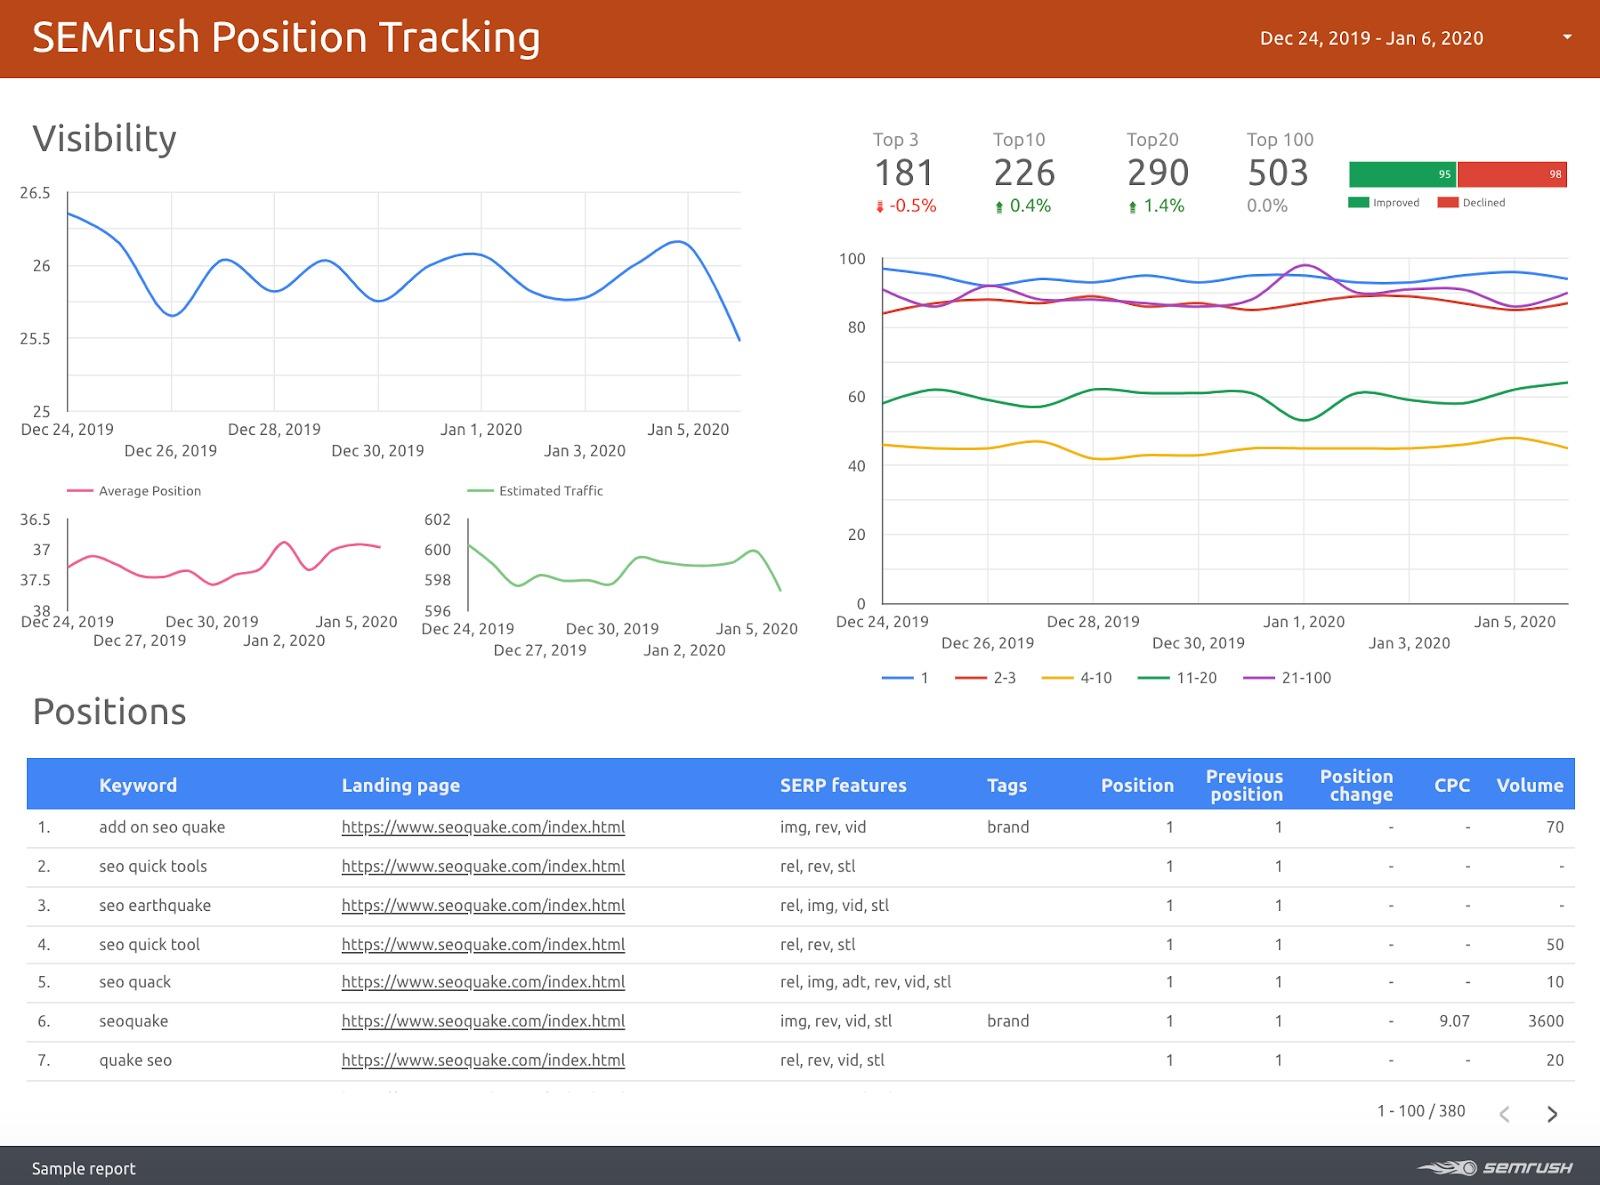 Integrating Semrush with Google Data Studio image 1